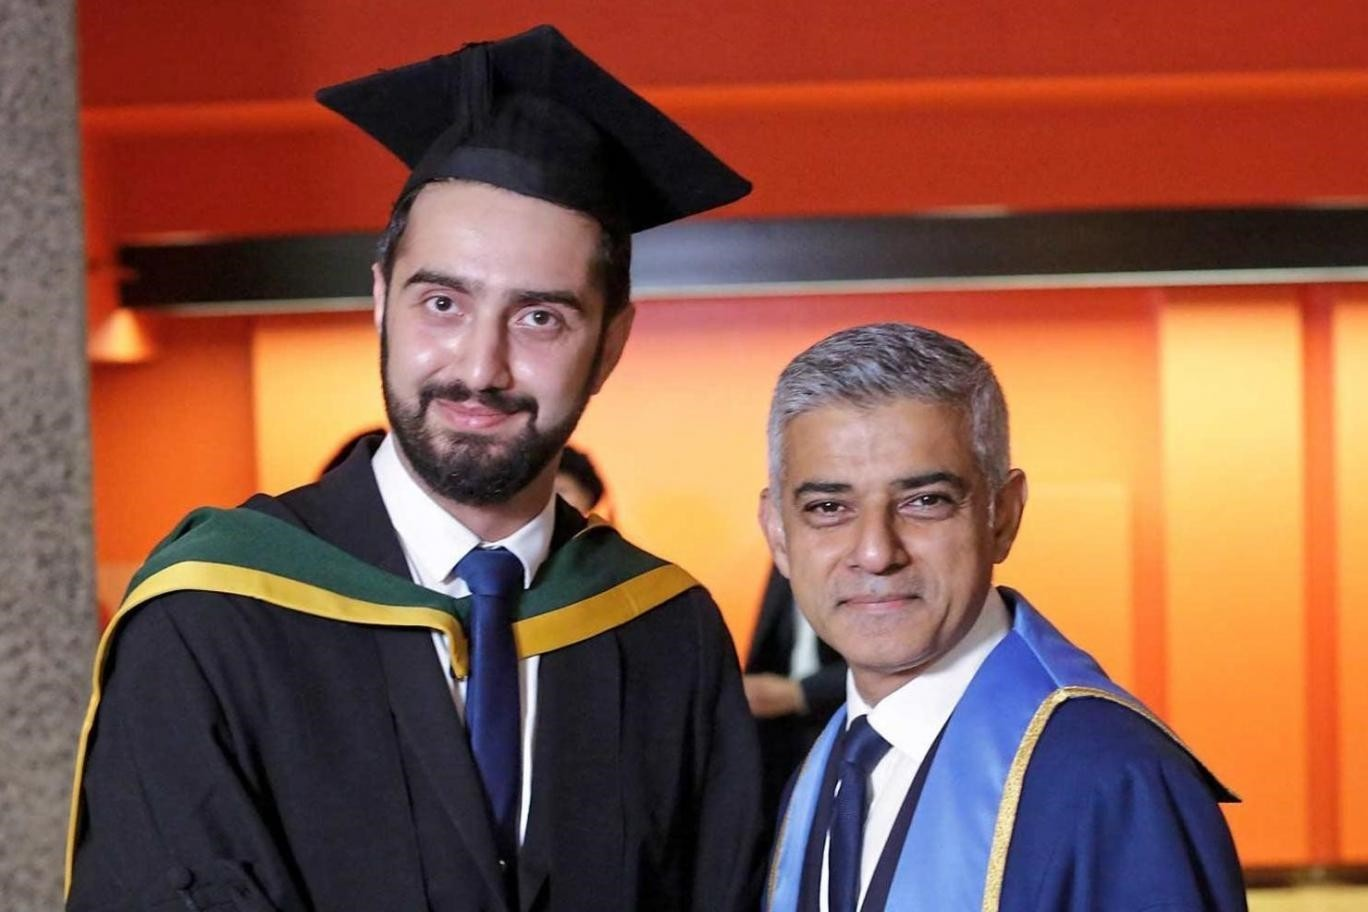 Tirej Brimo poses with London Mayor Sadiq Khan at his graduation ceremony St George's, University of London.